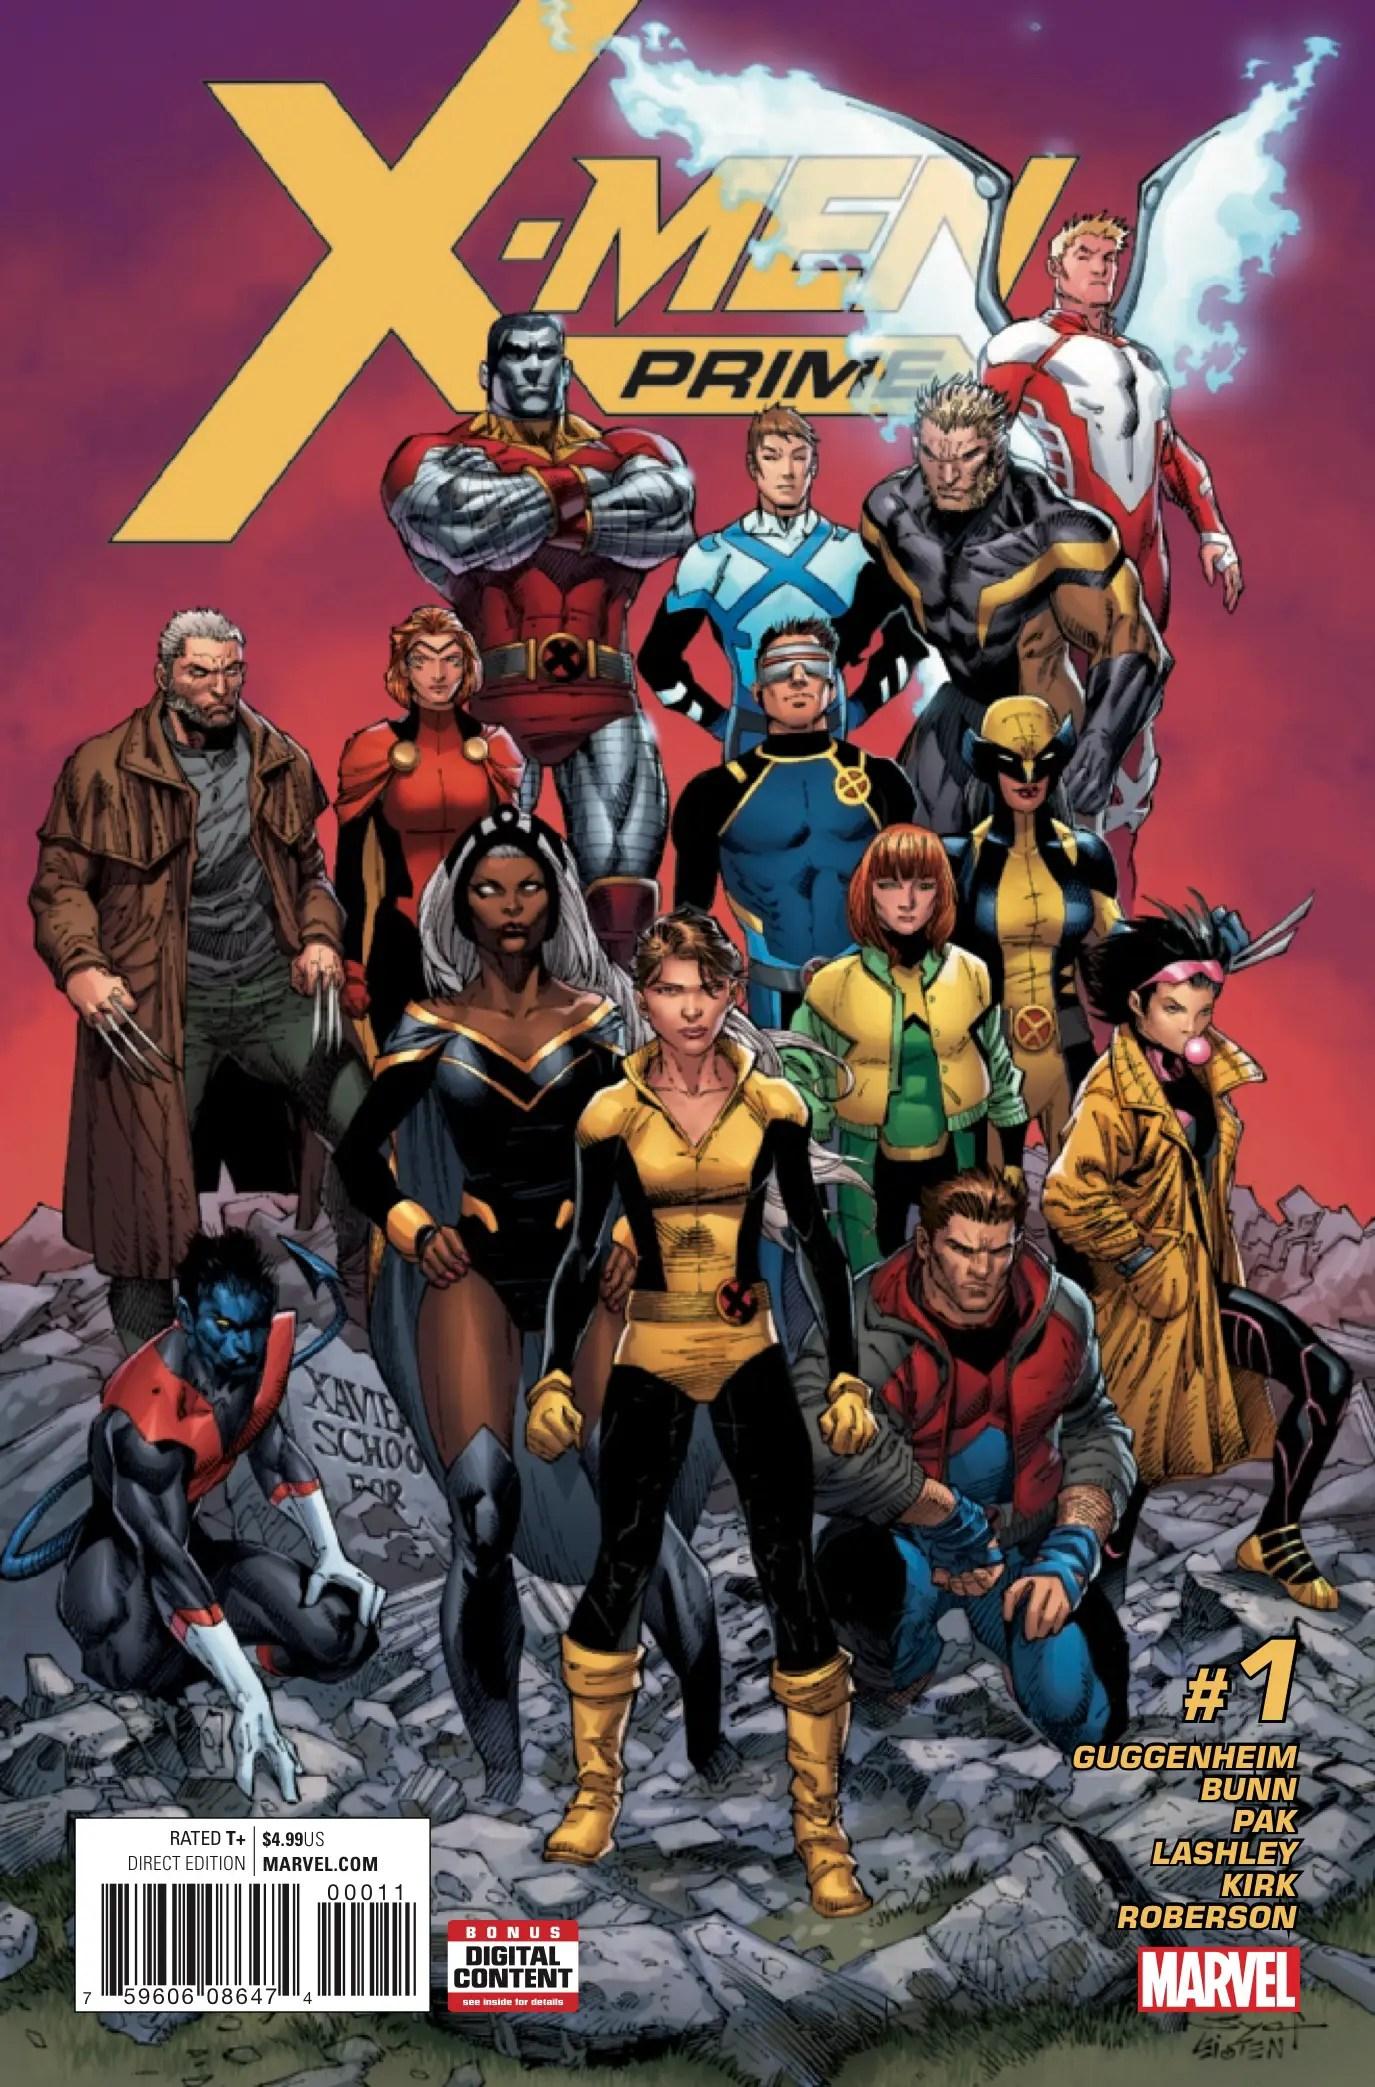 X-Men Prime #1 Review